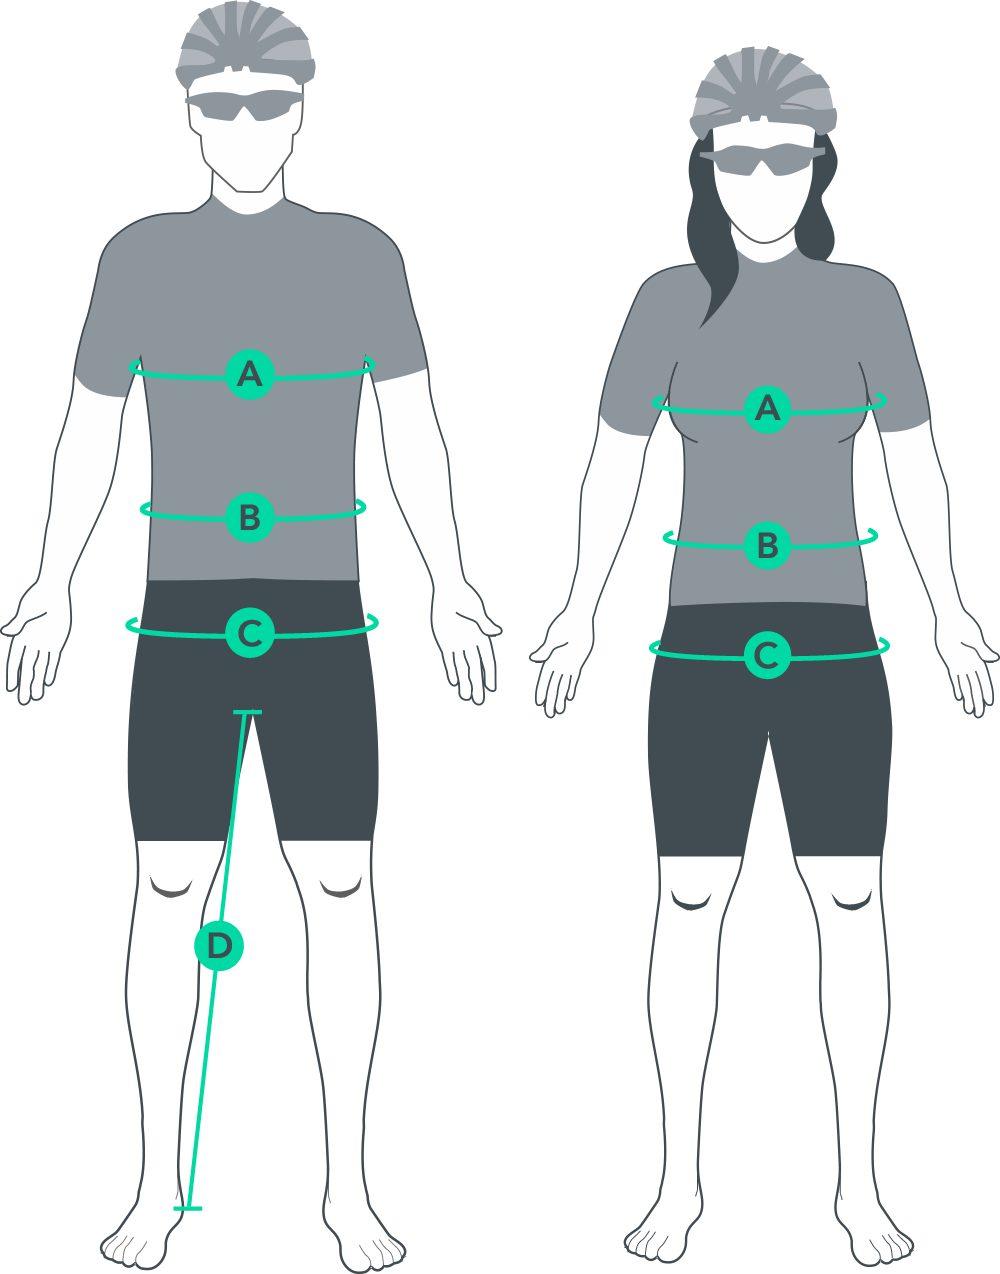 Bib Shorts size guide